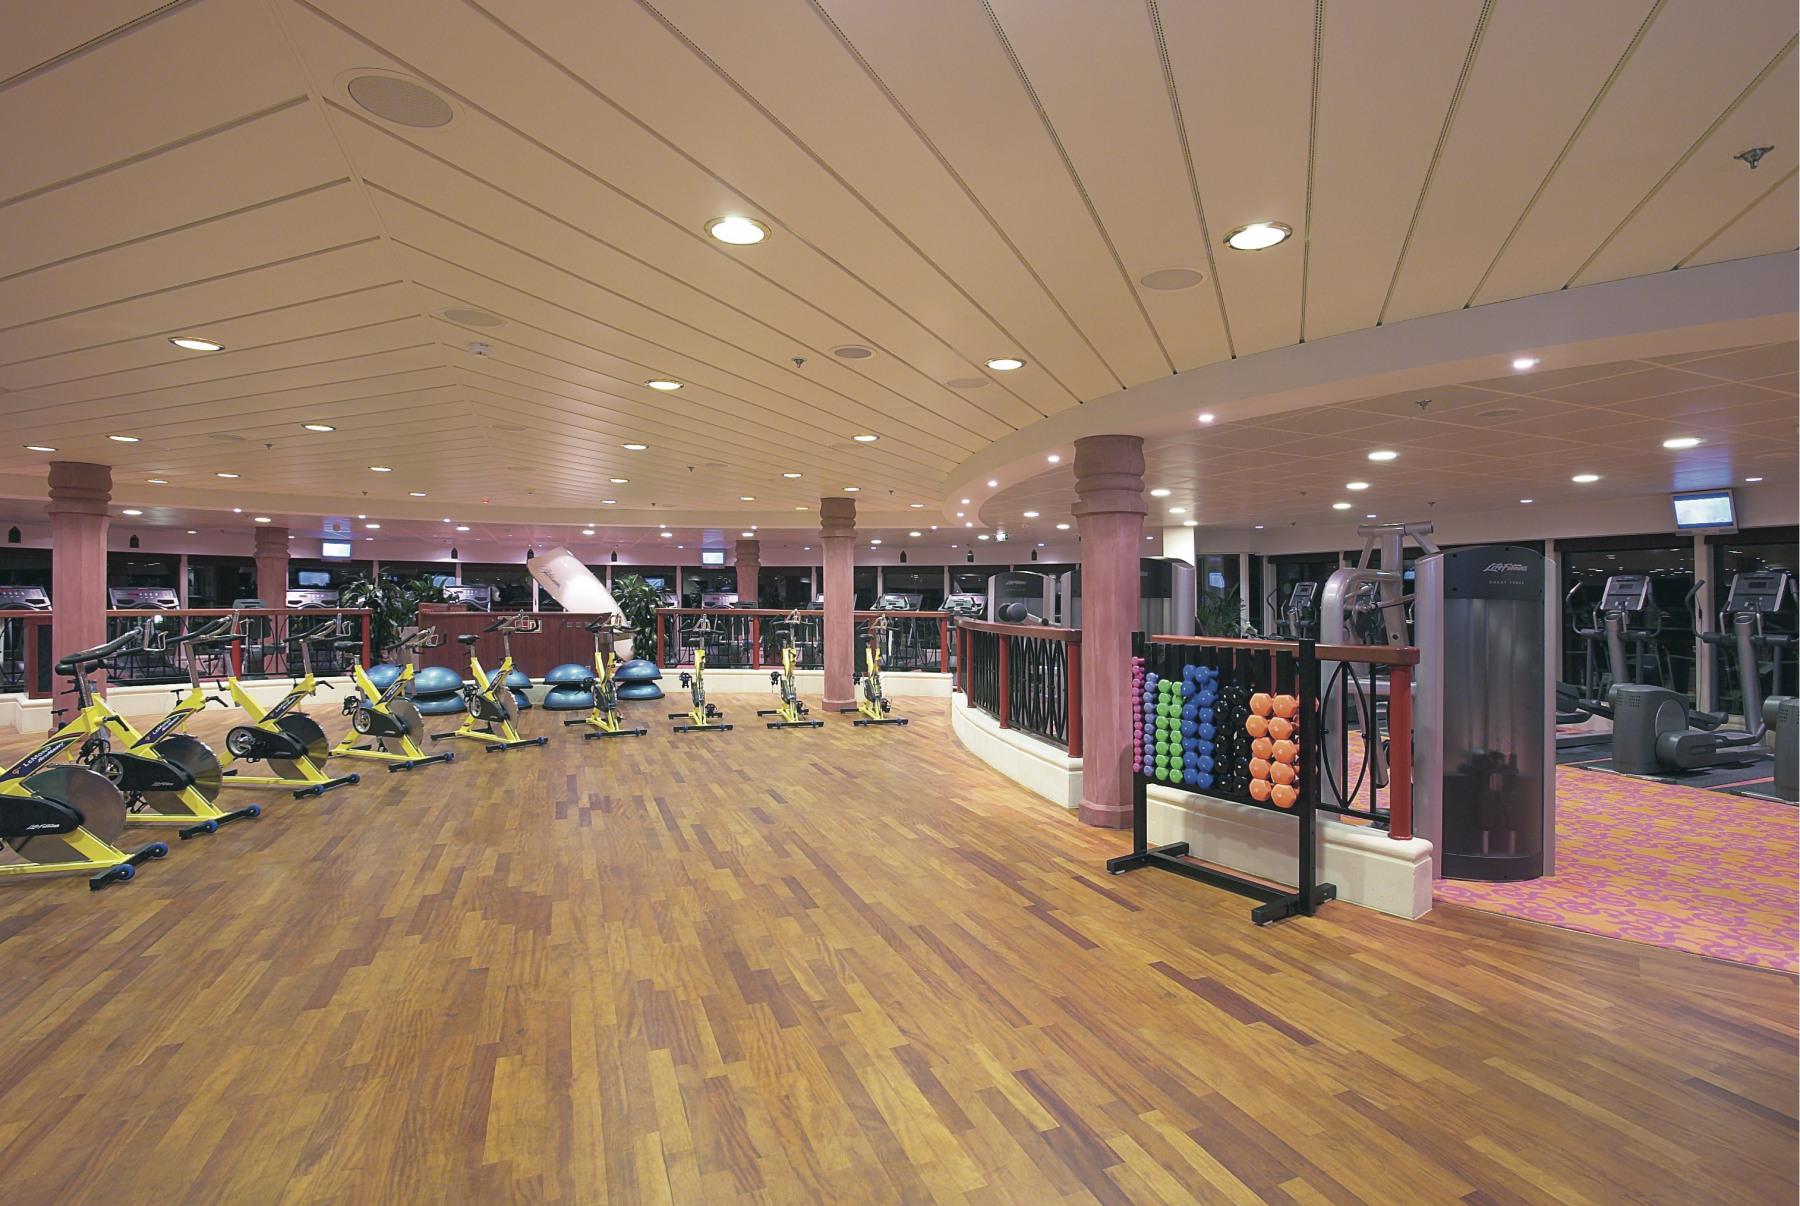 Royal Caribbean International Jewel of the Seas Interior ShipShape 2.jpeg